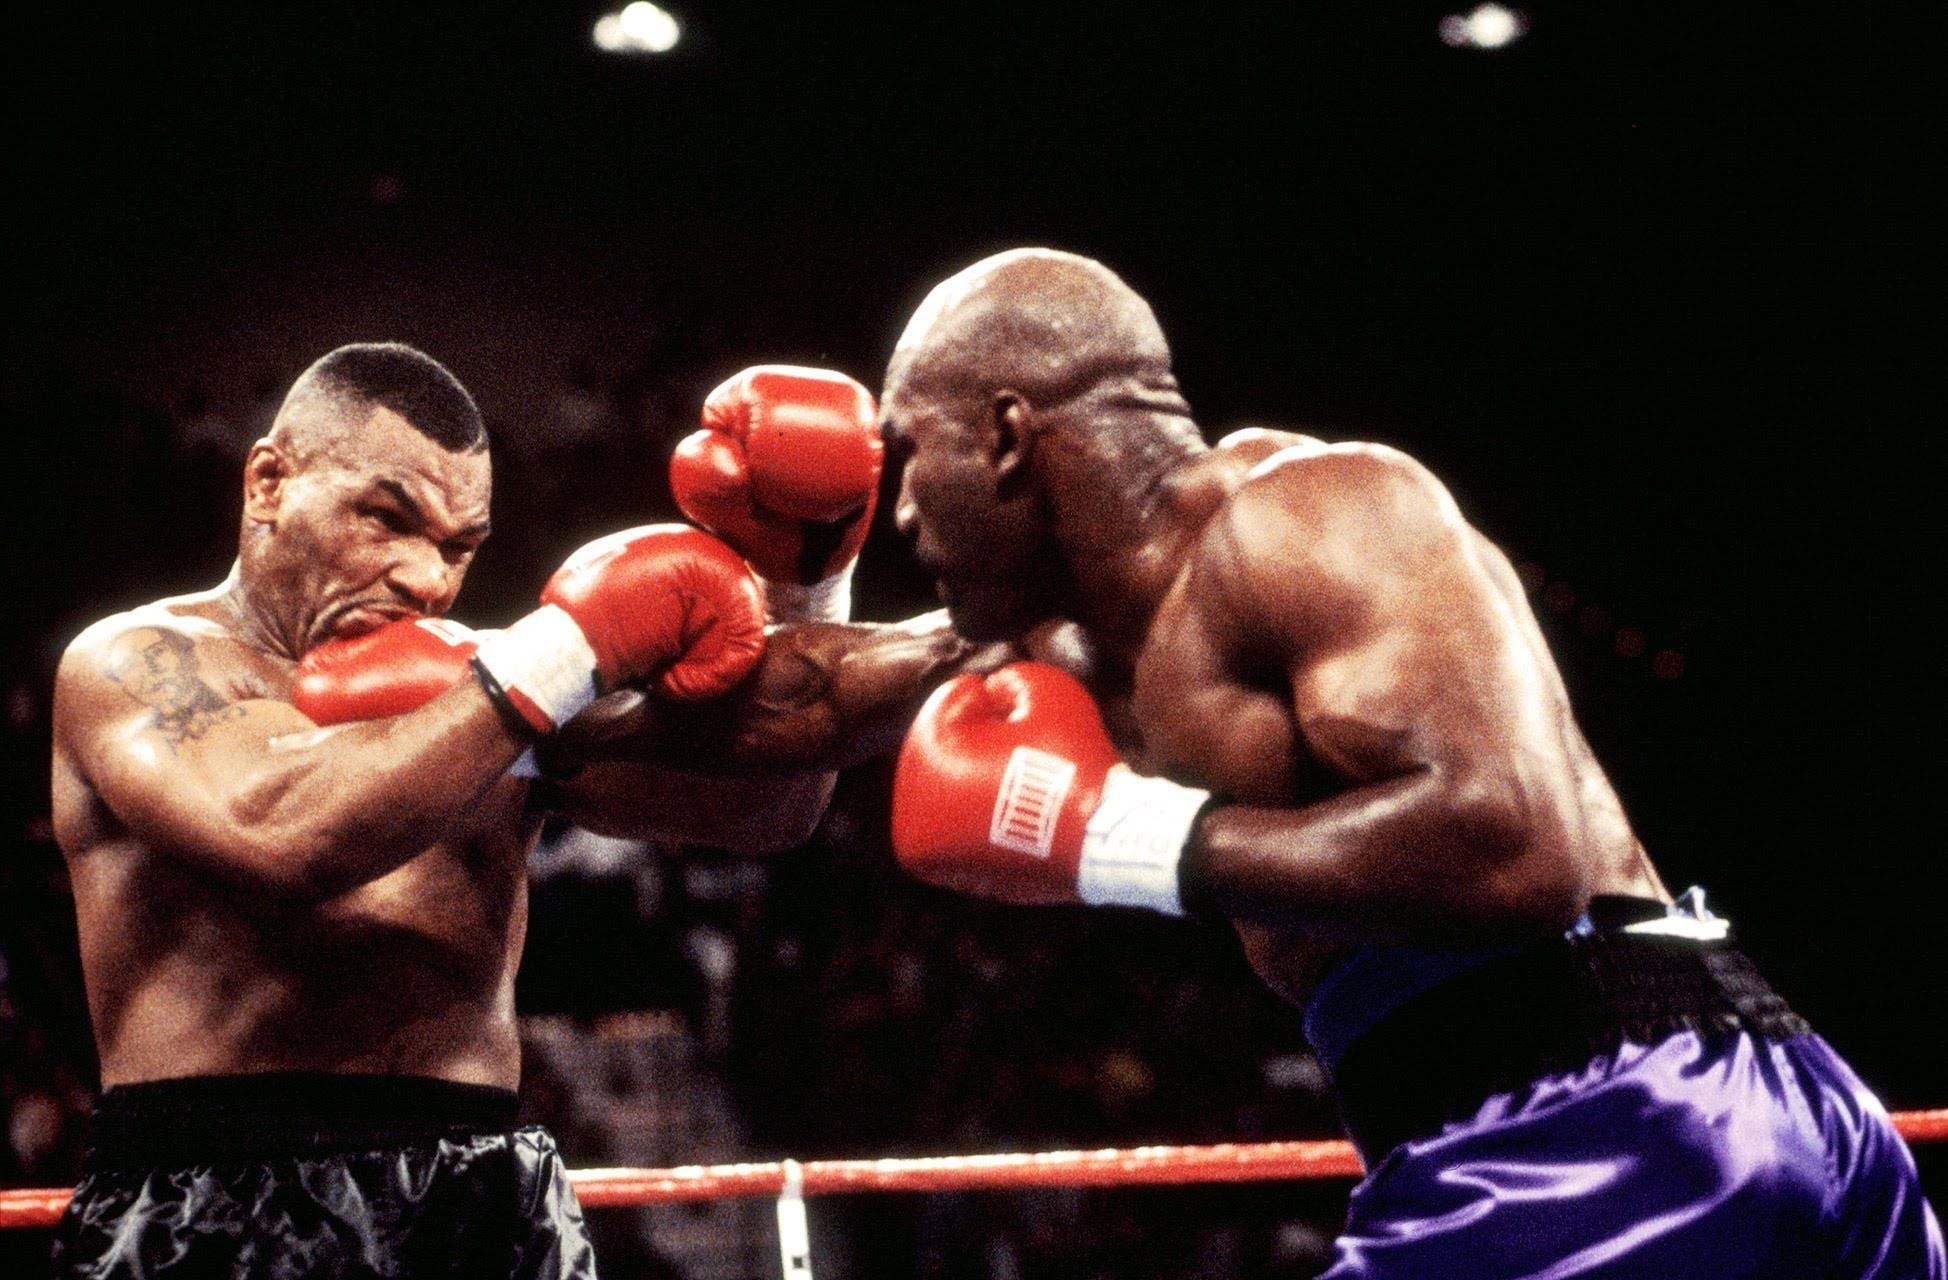 Boxing legend Mike Tyson